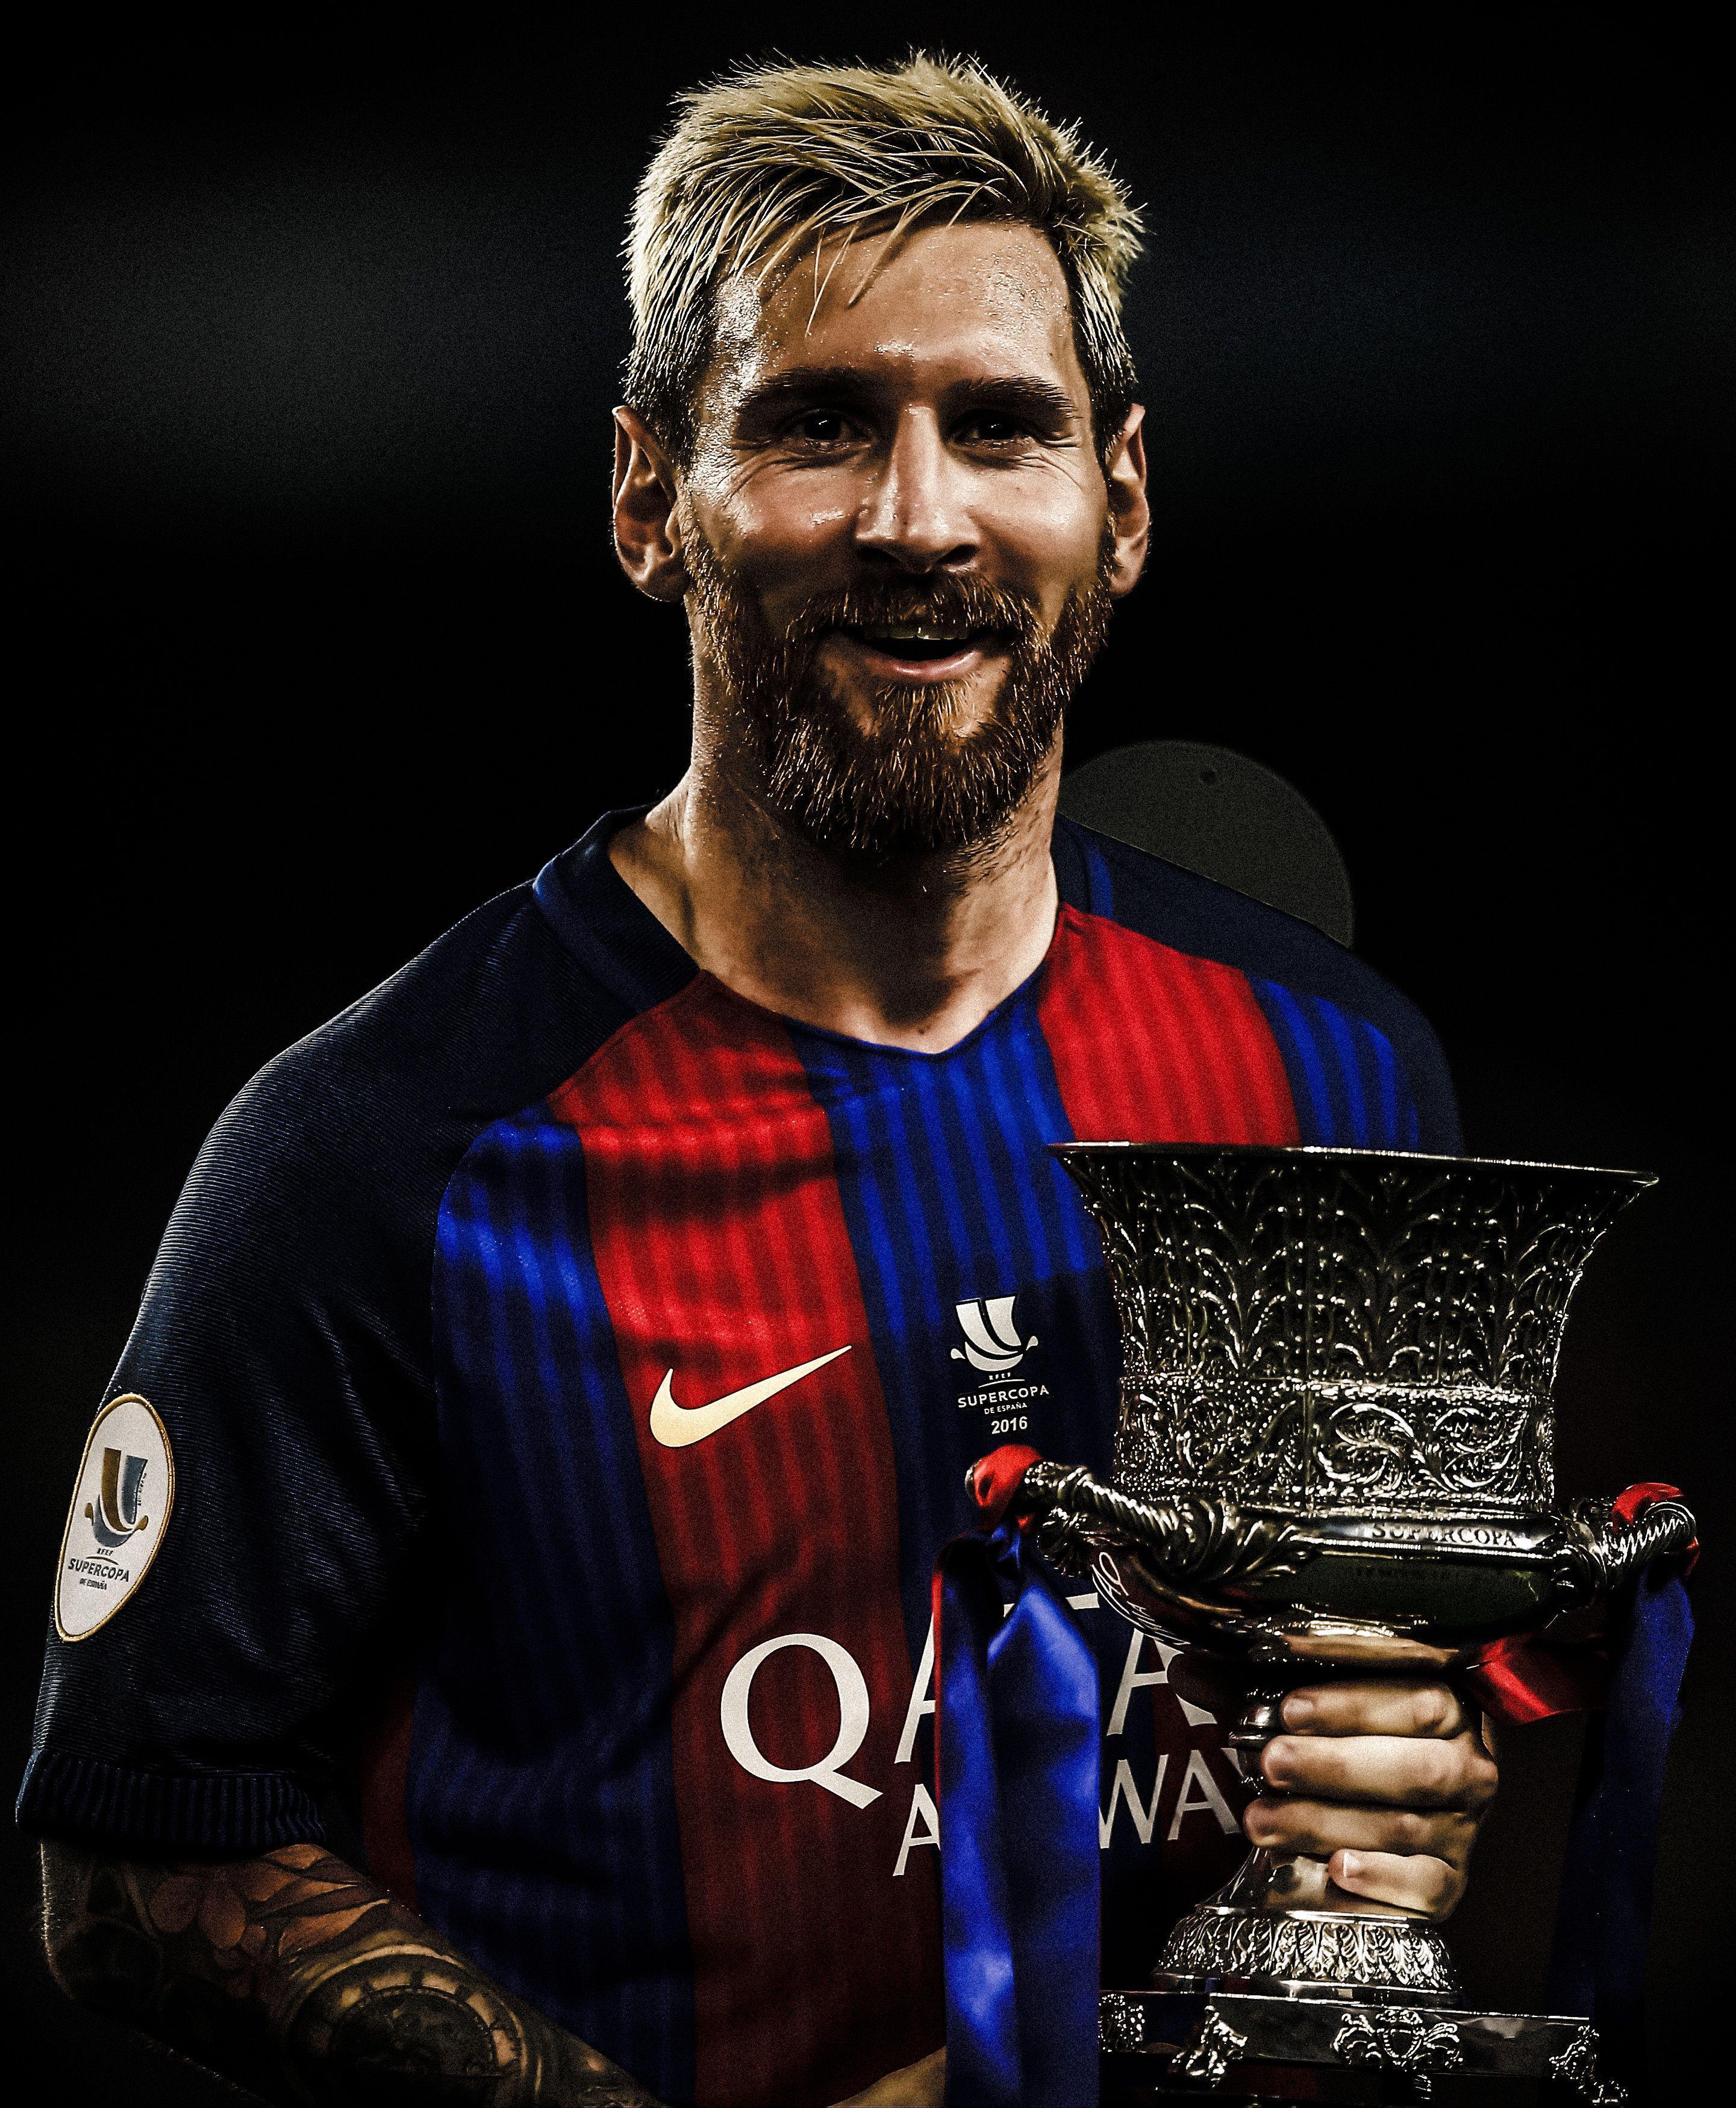 Wallpaper Of Messi: Messi Beard Wallpapers